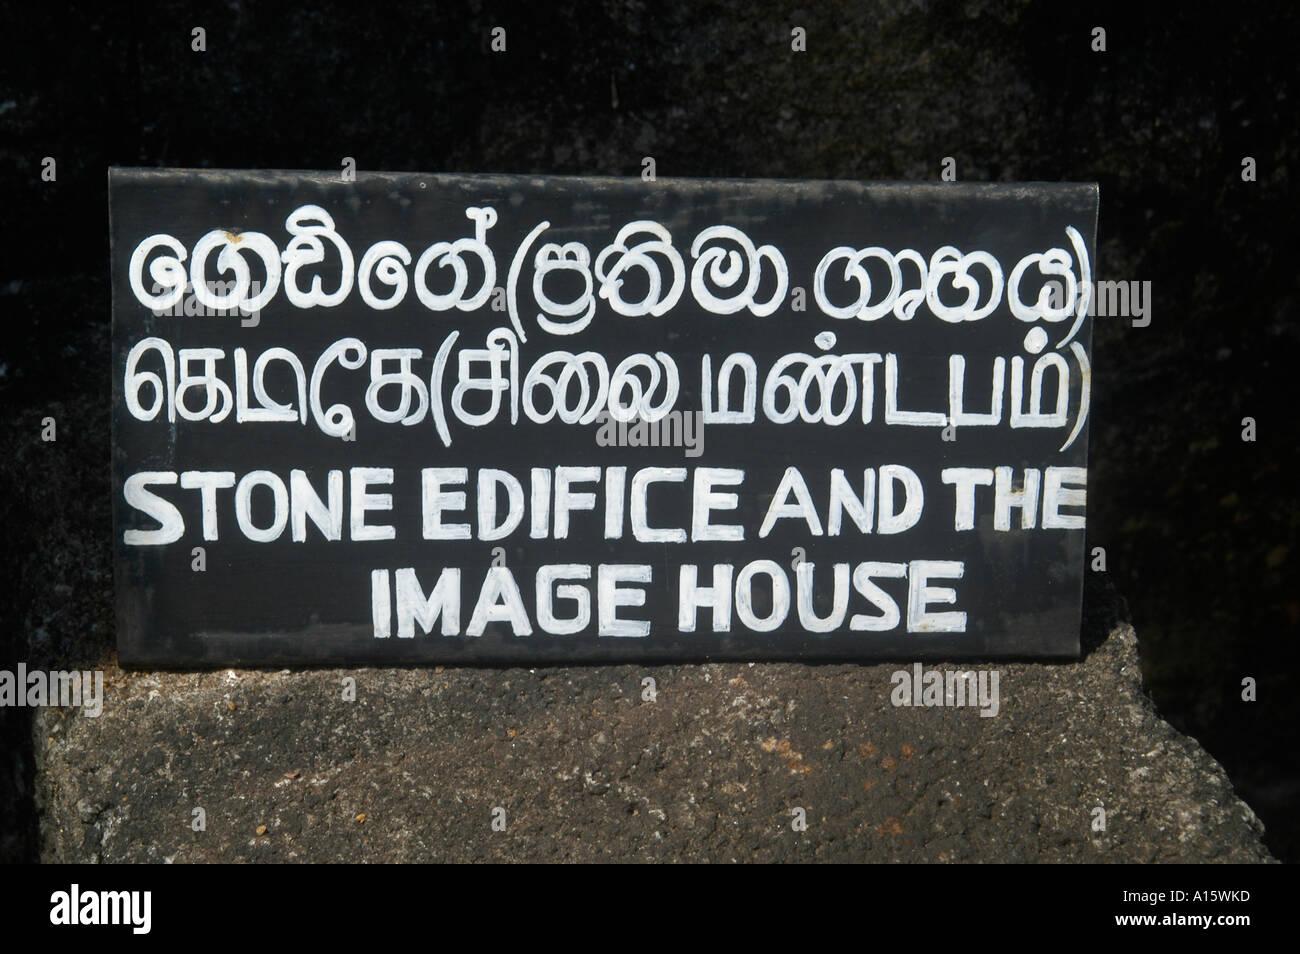 Sri Lanka stone edifice and the image house sign information - Stock Image